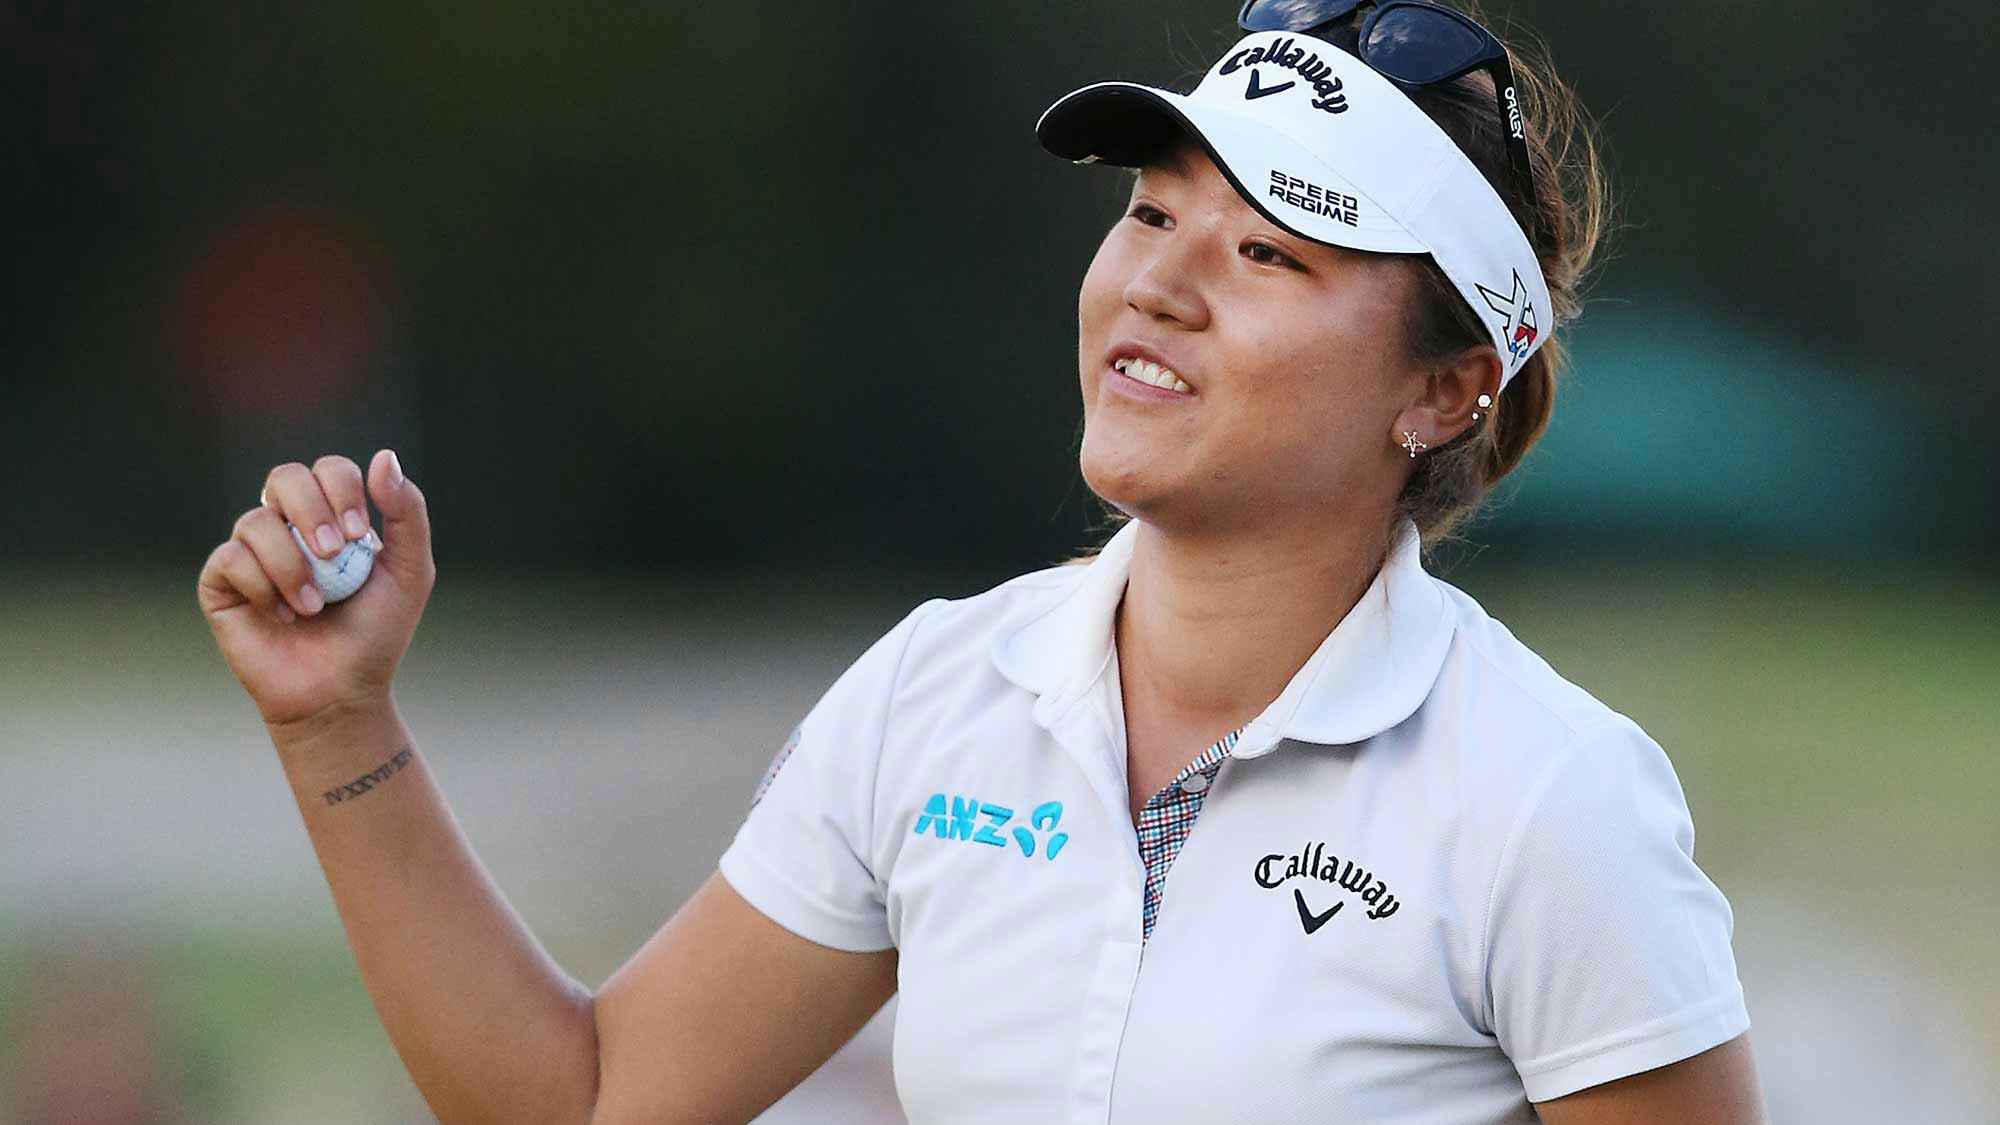 Womens canadian amateur golf